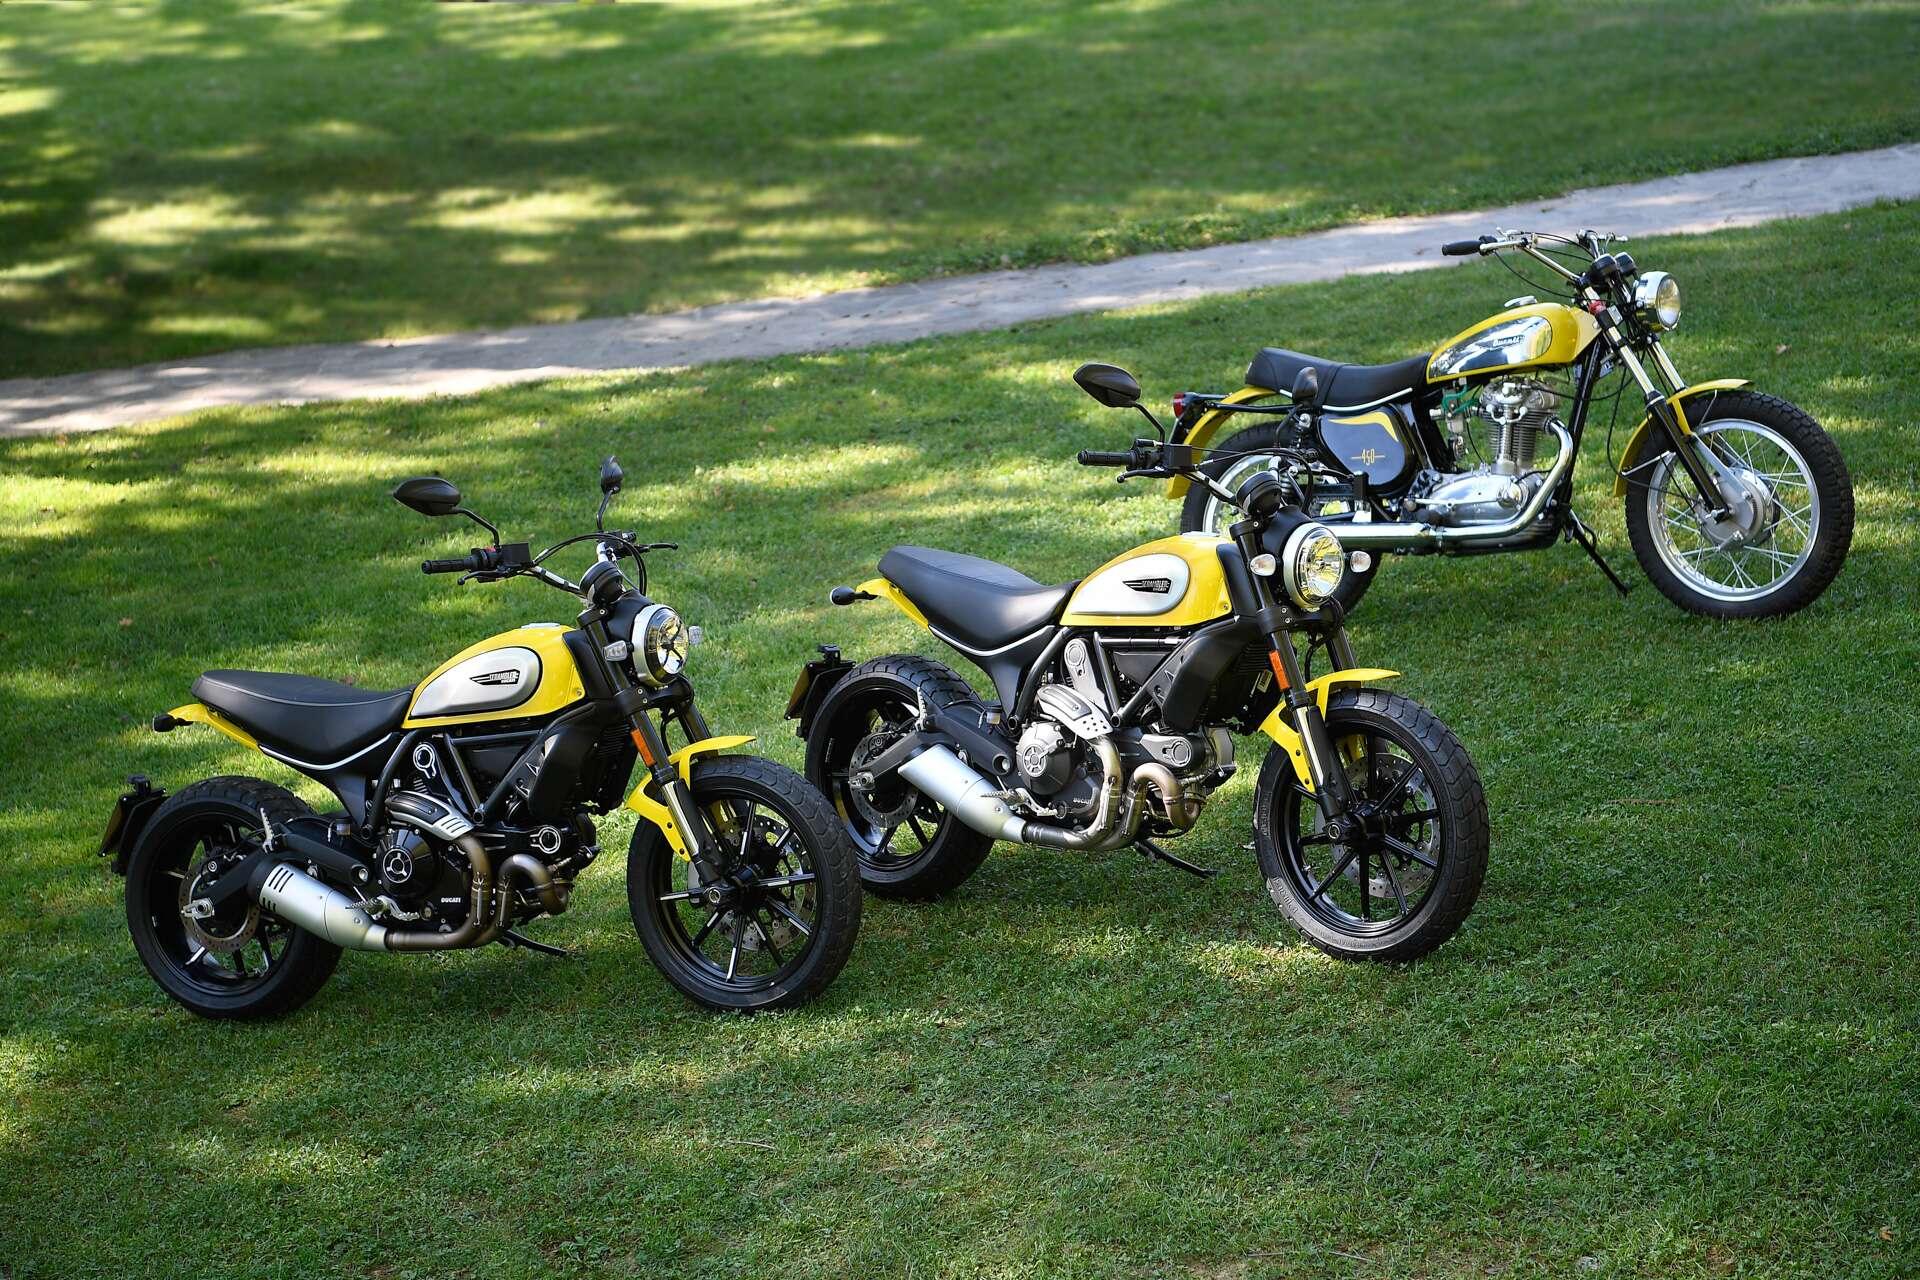 2019 Ducati Scrambler Icon First Ride A Modern Classic Meets Future